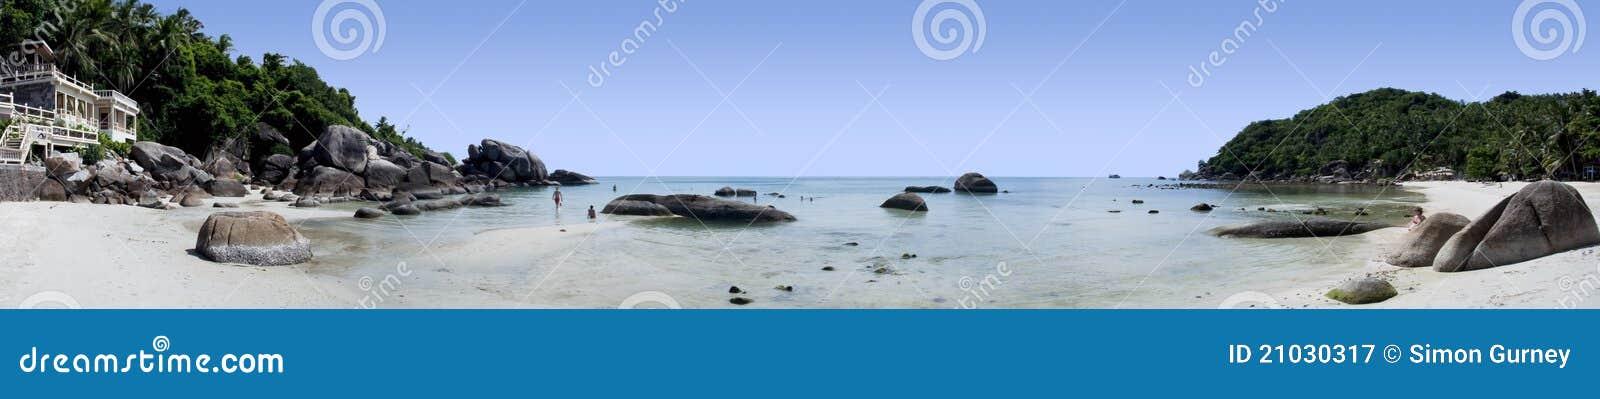 Samui Таиланд курорта панорамы koh пляжа